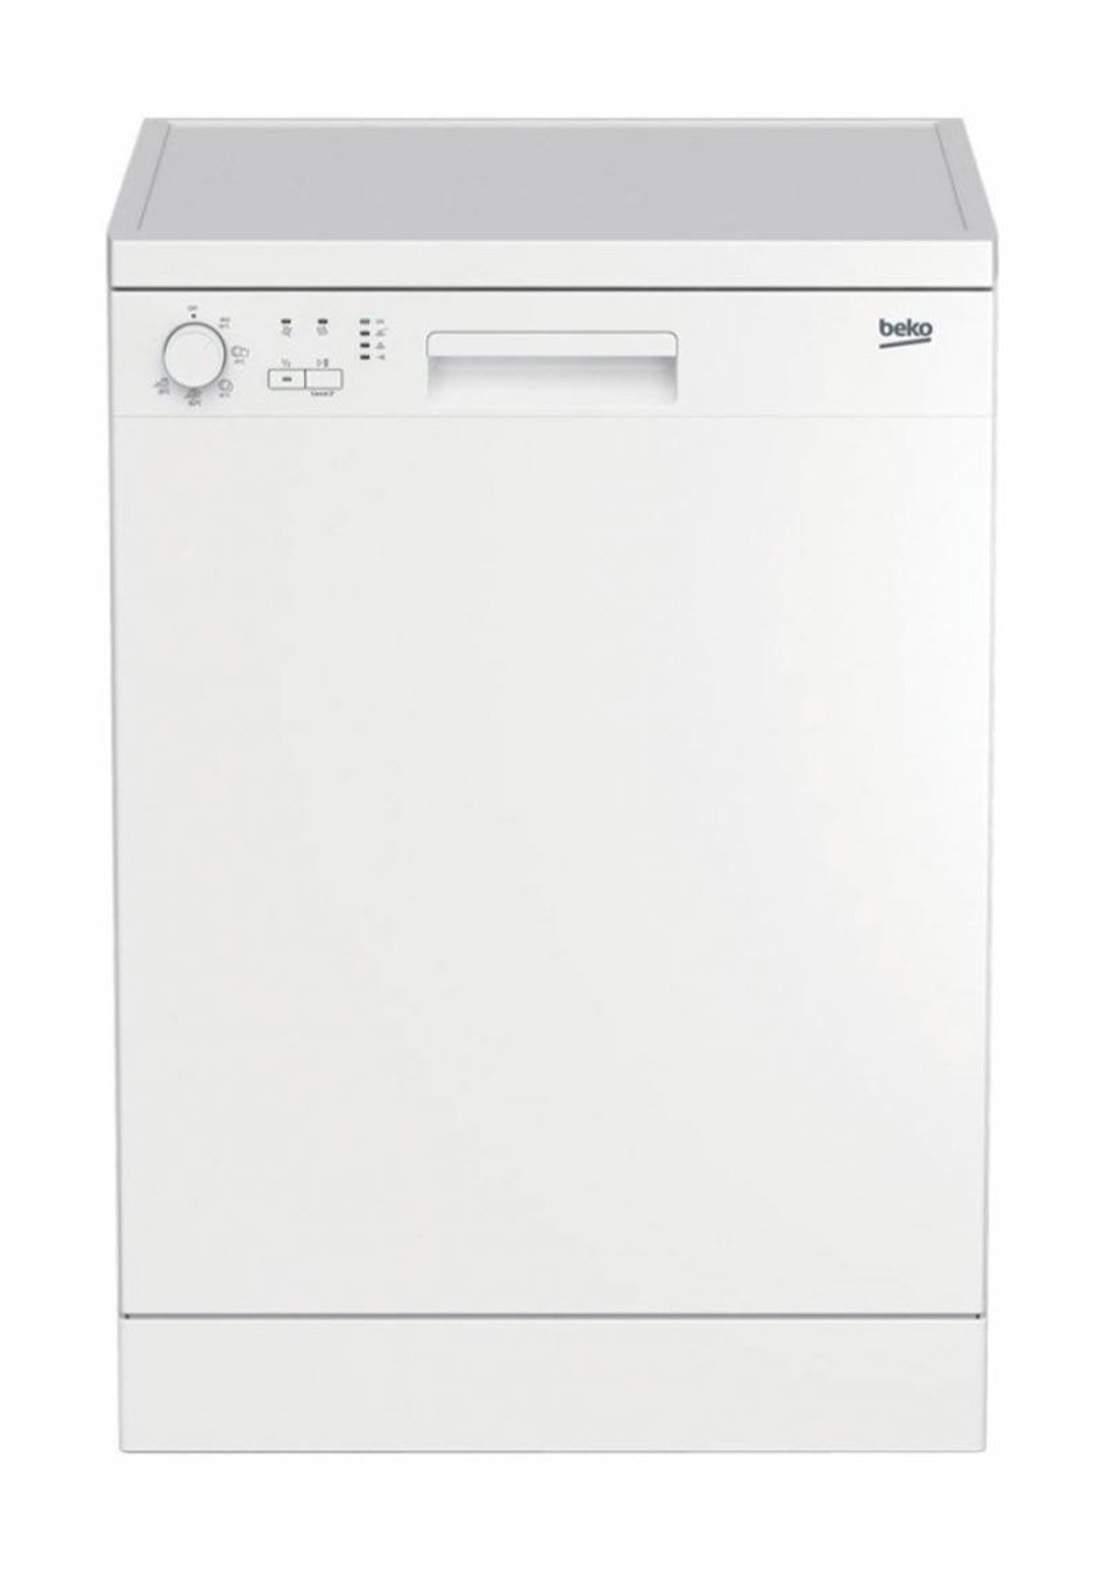 Beko  DFN 05311 W Dishwasher 5 Programs Capacity Of 13 Sets - White غسالة صحون